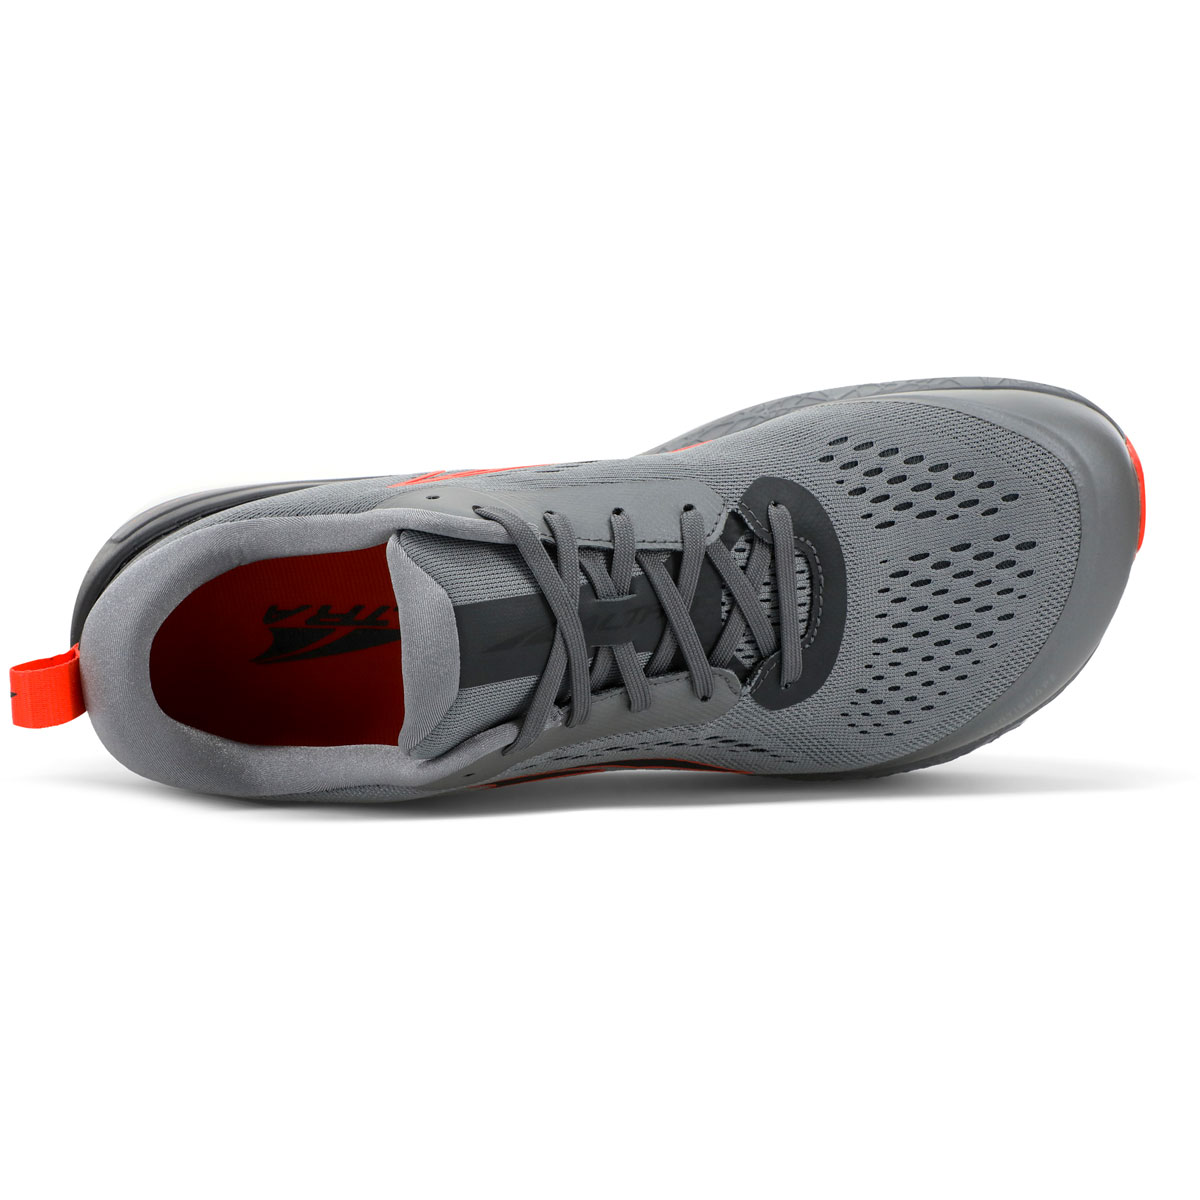 Men's Altra Paradigm 5 Running Shoe - Color: Gray/Orange - Size: 7 - Width: Regular, Gray/Orange, large, image 3